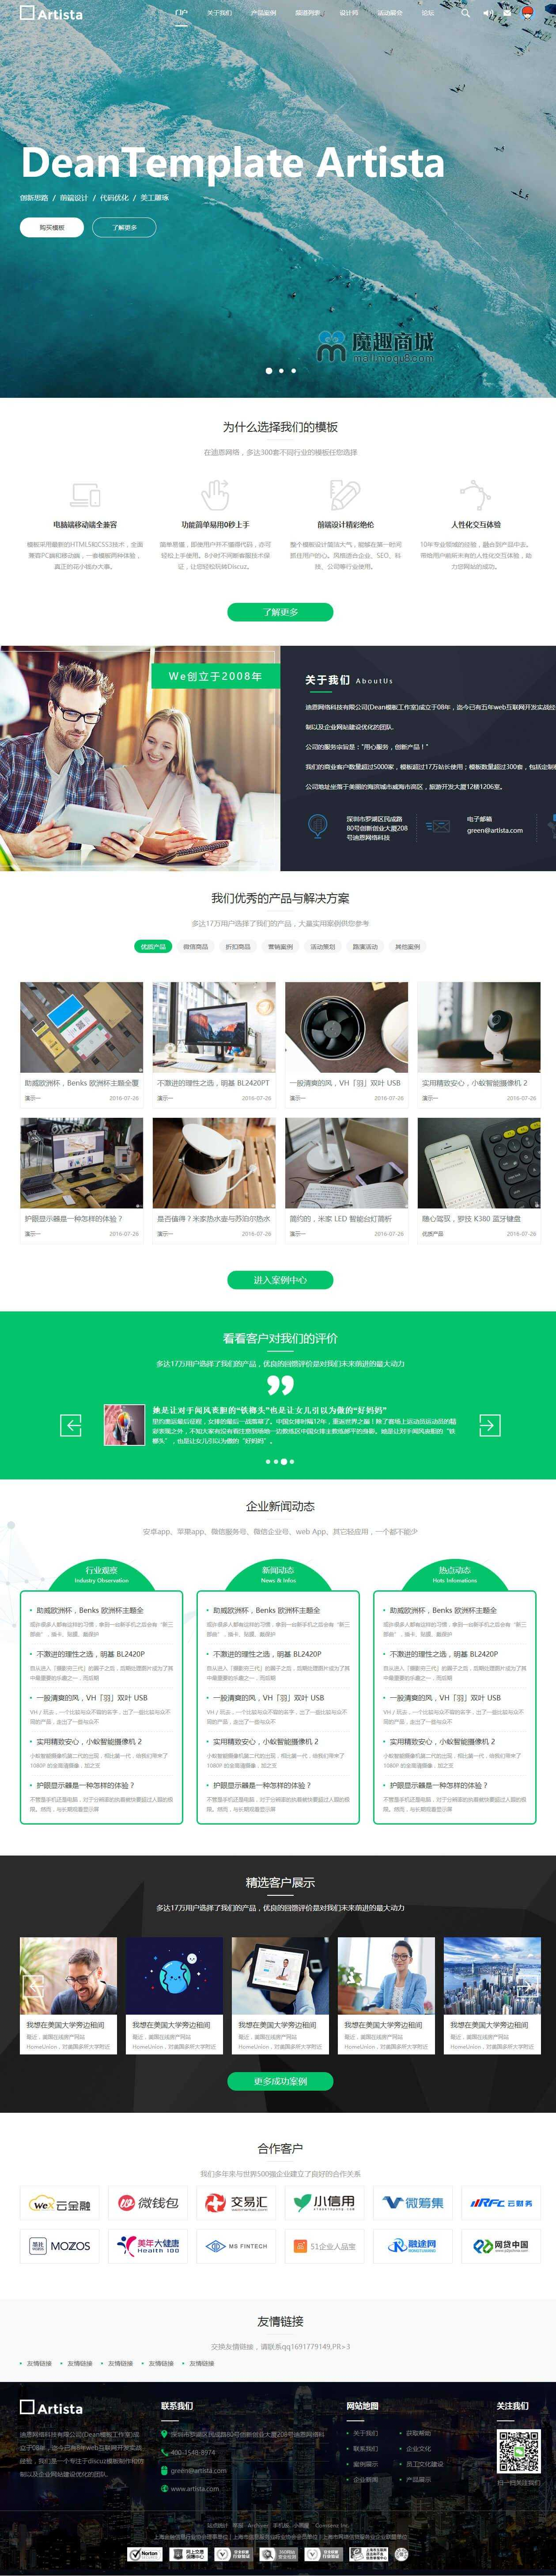 <font color='#0000ff'>魔趣艺术企业创意设计公司模板</font>